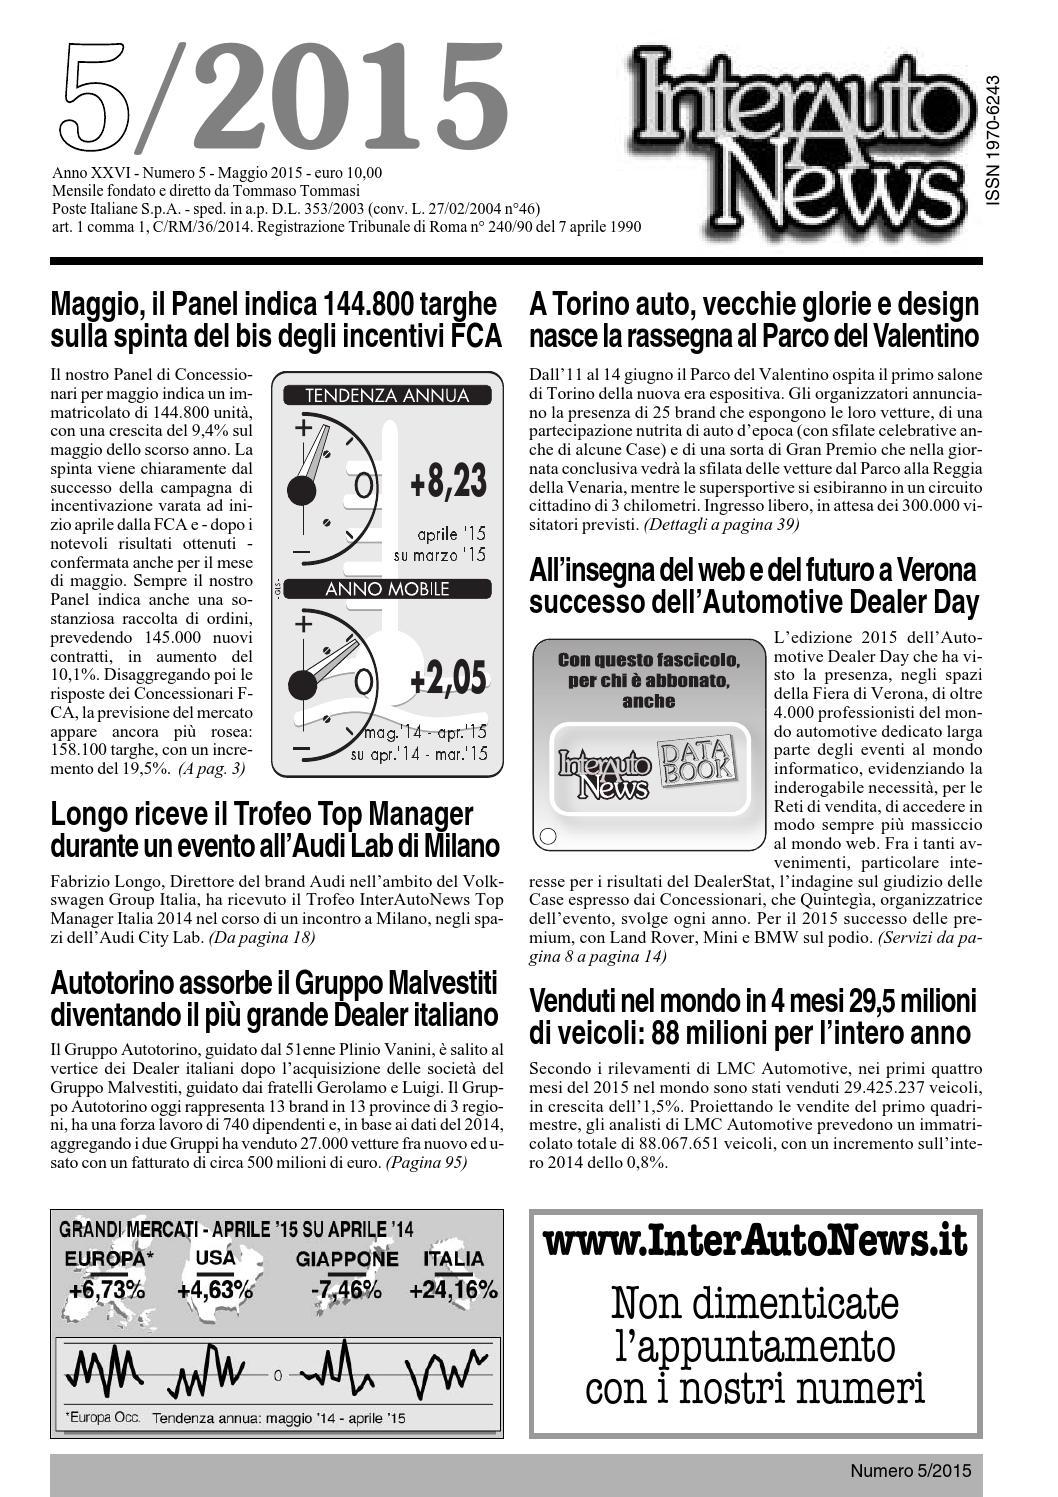 Ian 0515 By InterAutoNews Issuu